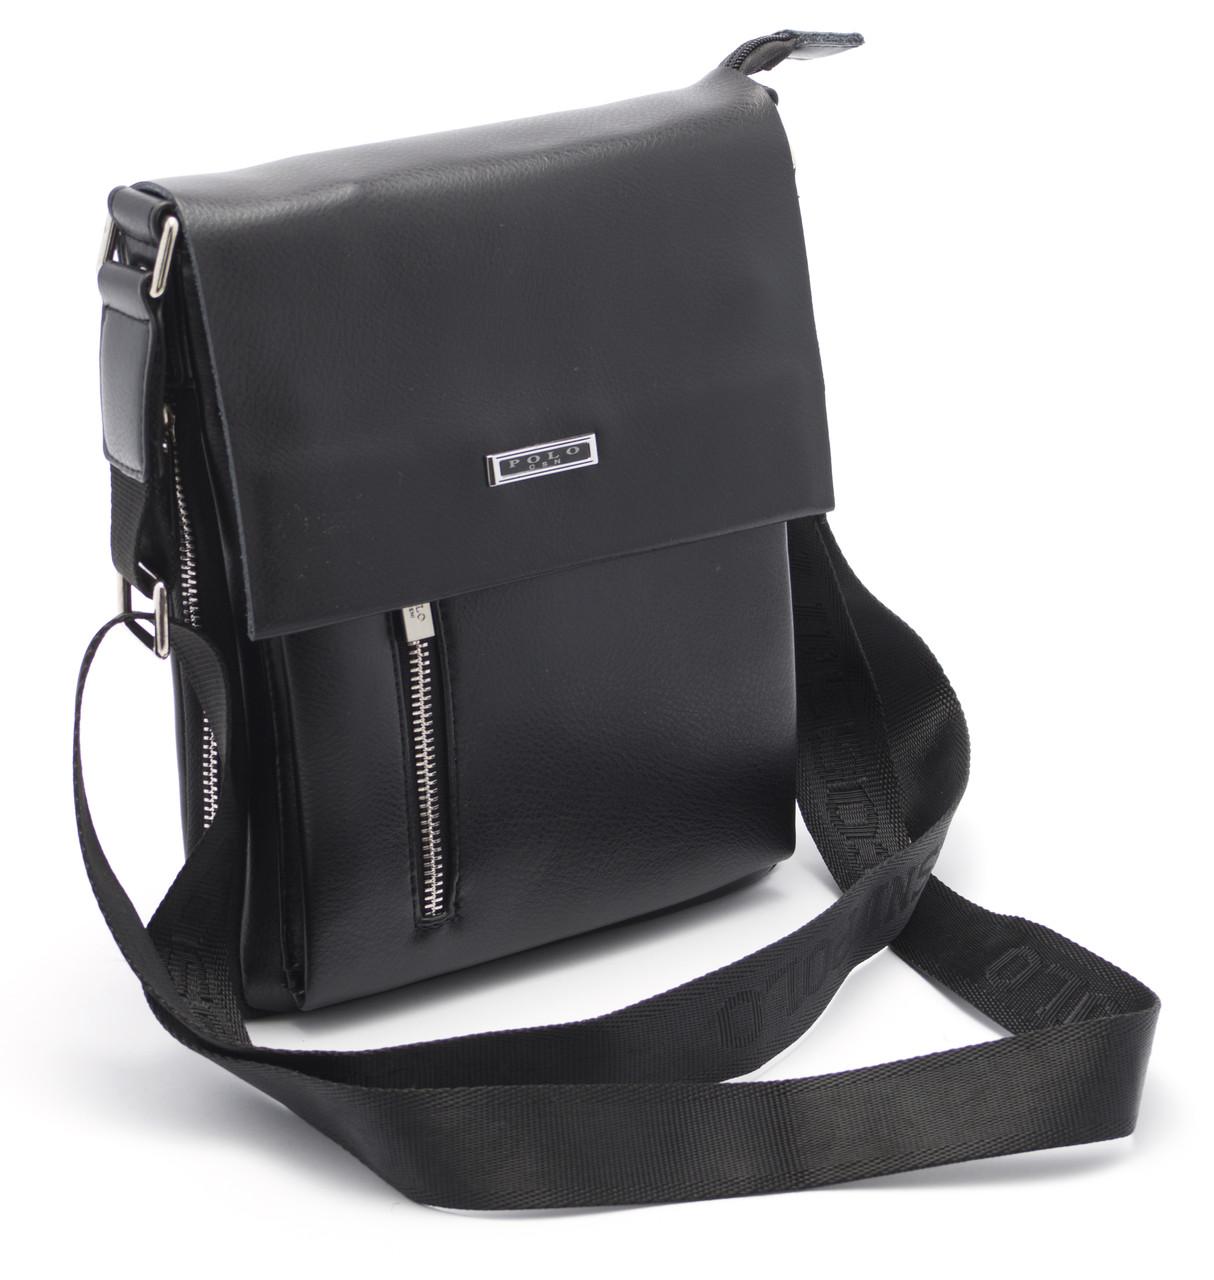 Элегантная мужская сумка LANGSA art. 6755-3